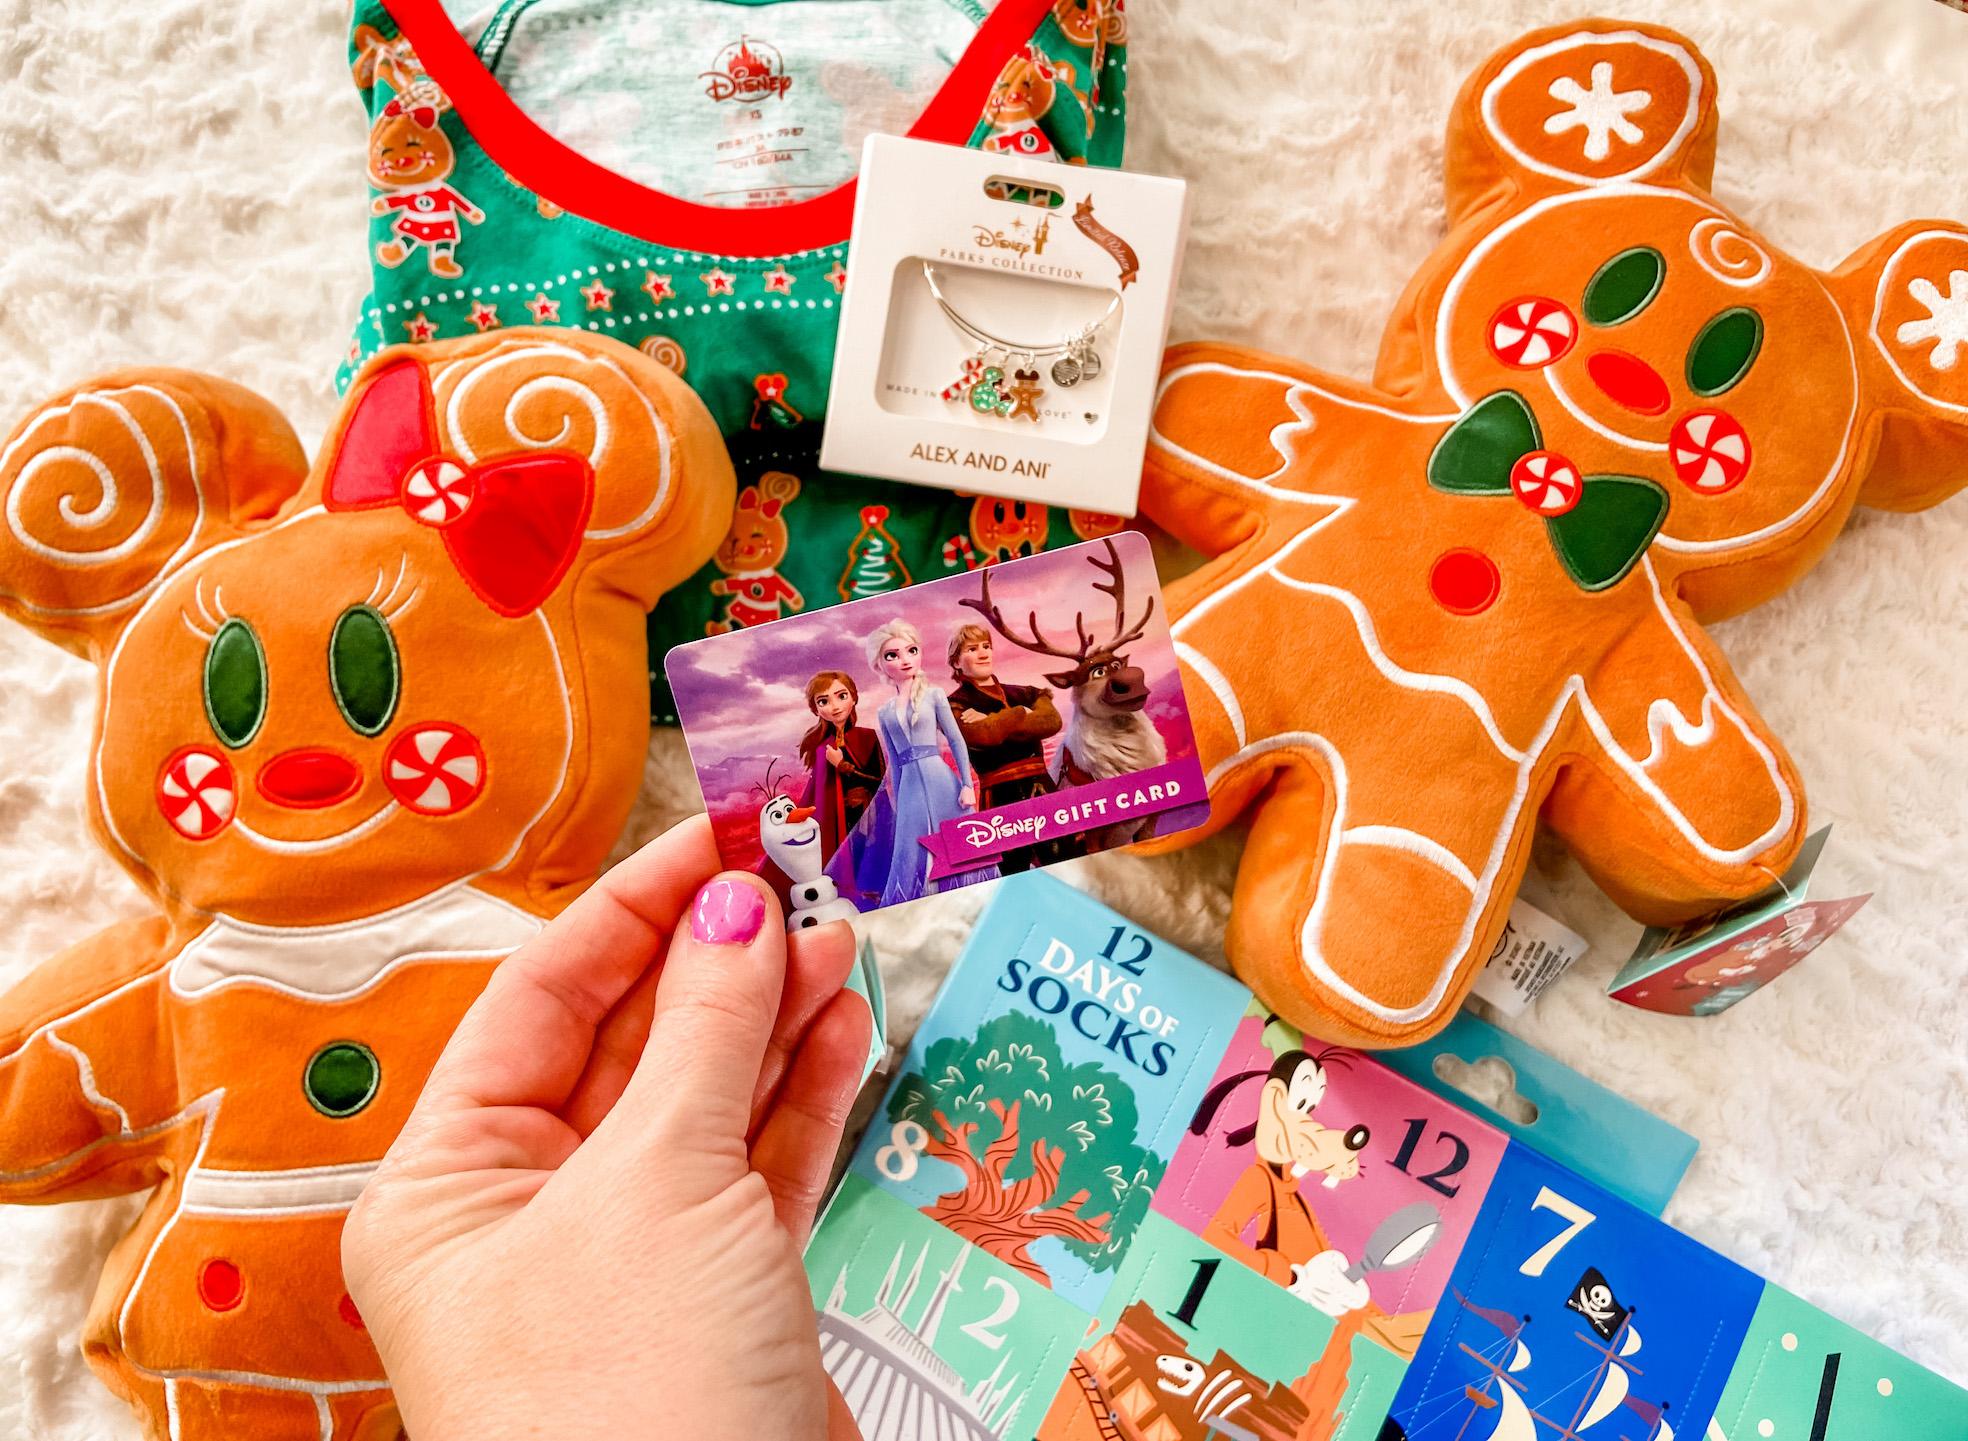 Disney Gift Card - Frozen 2